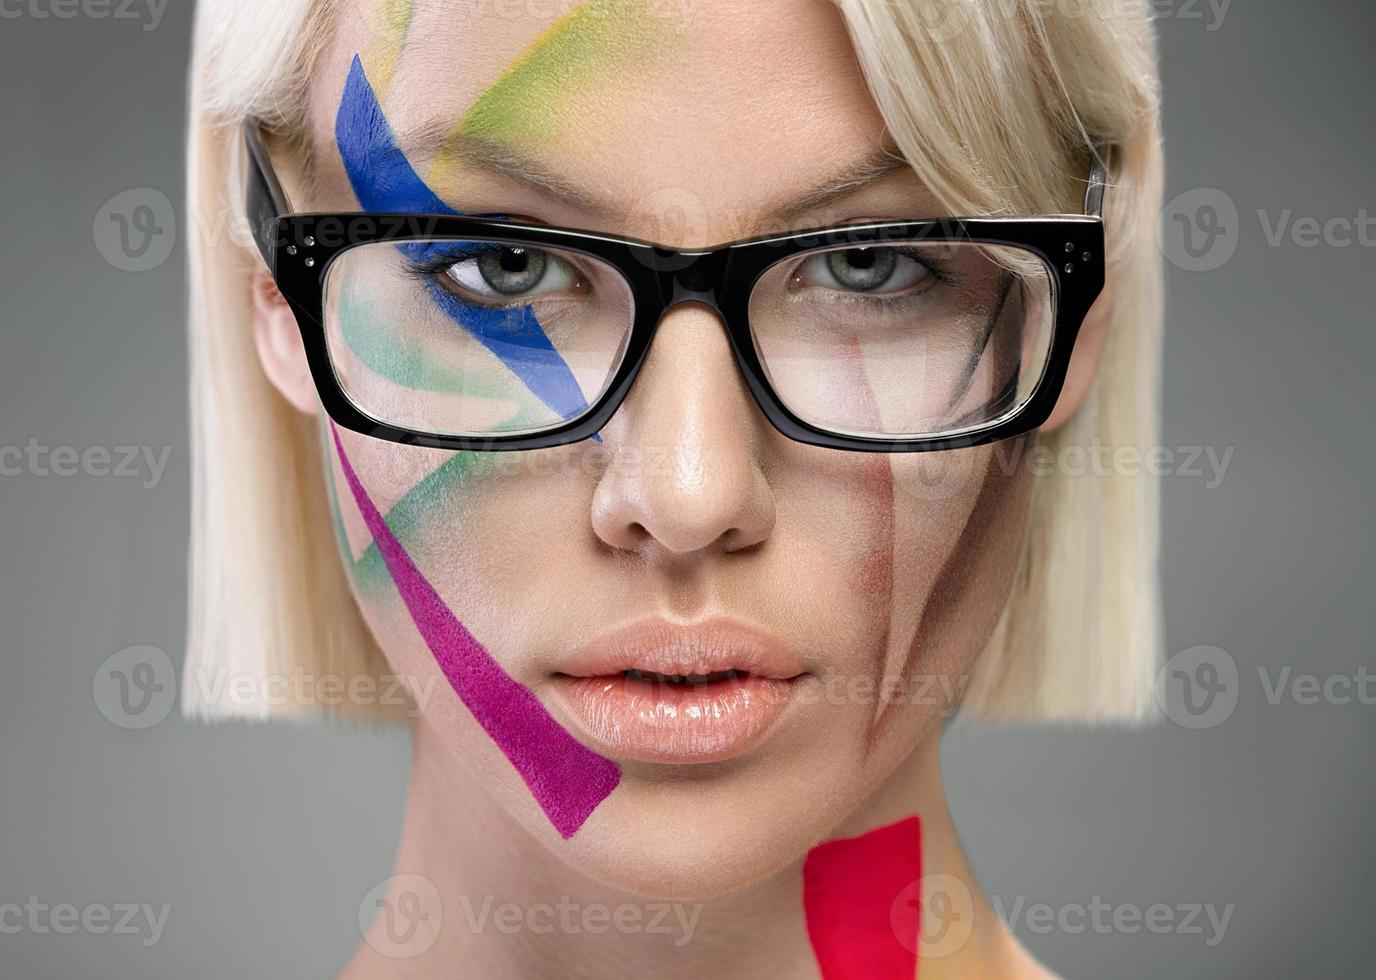 olhar de alta moda, retrato com óculos foto